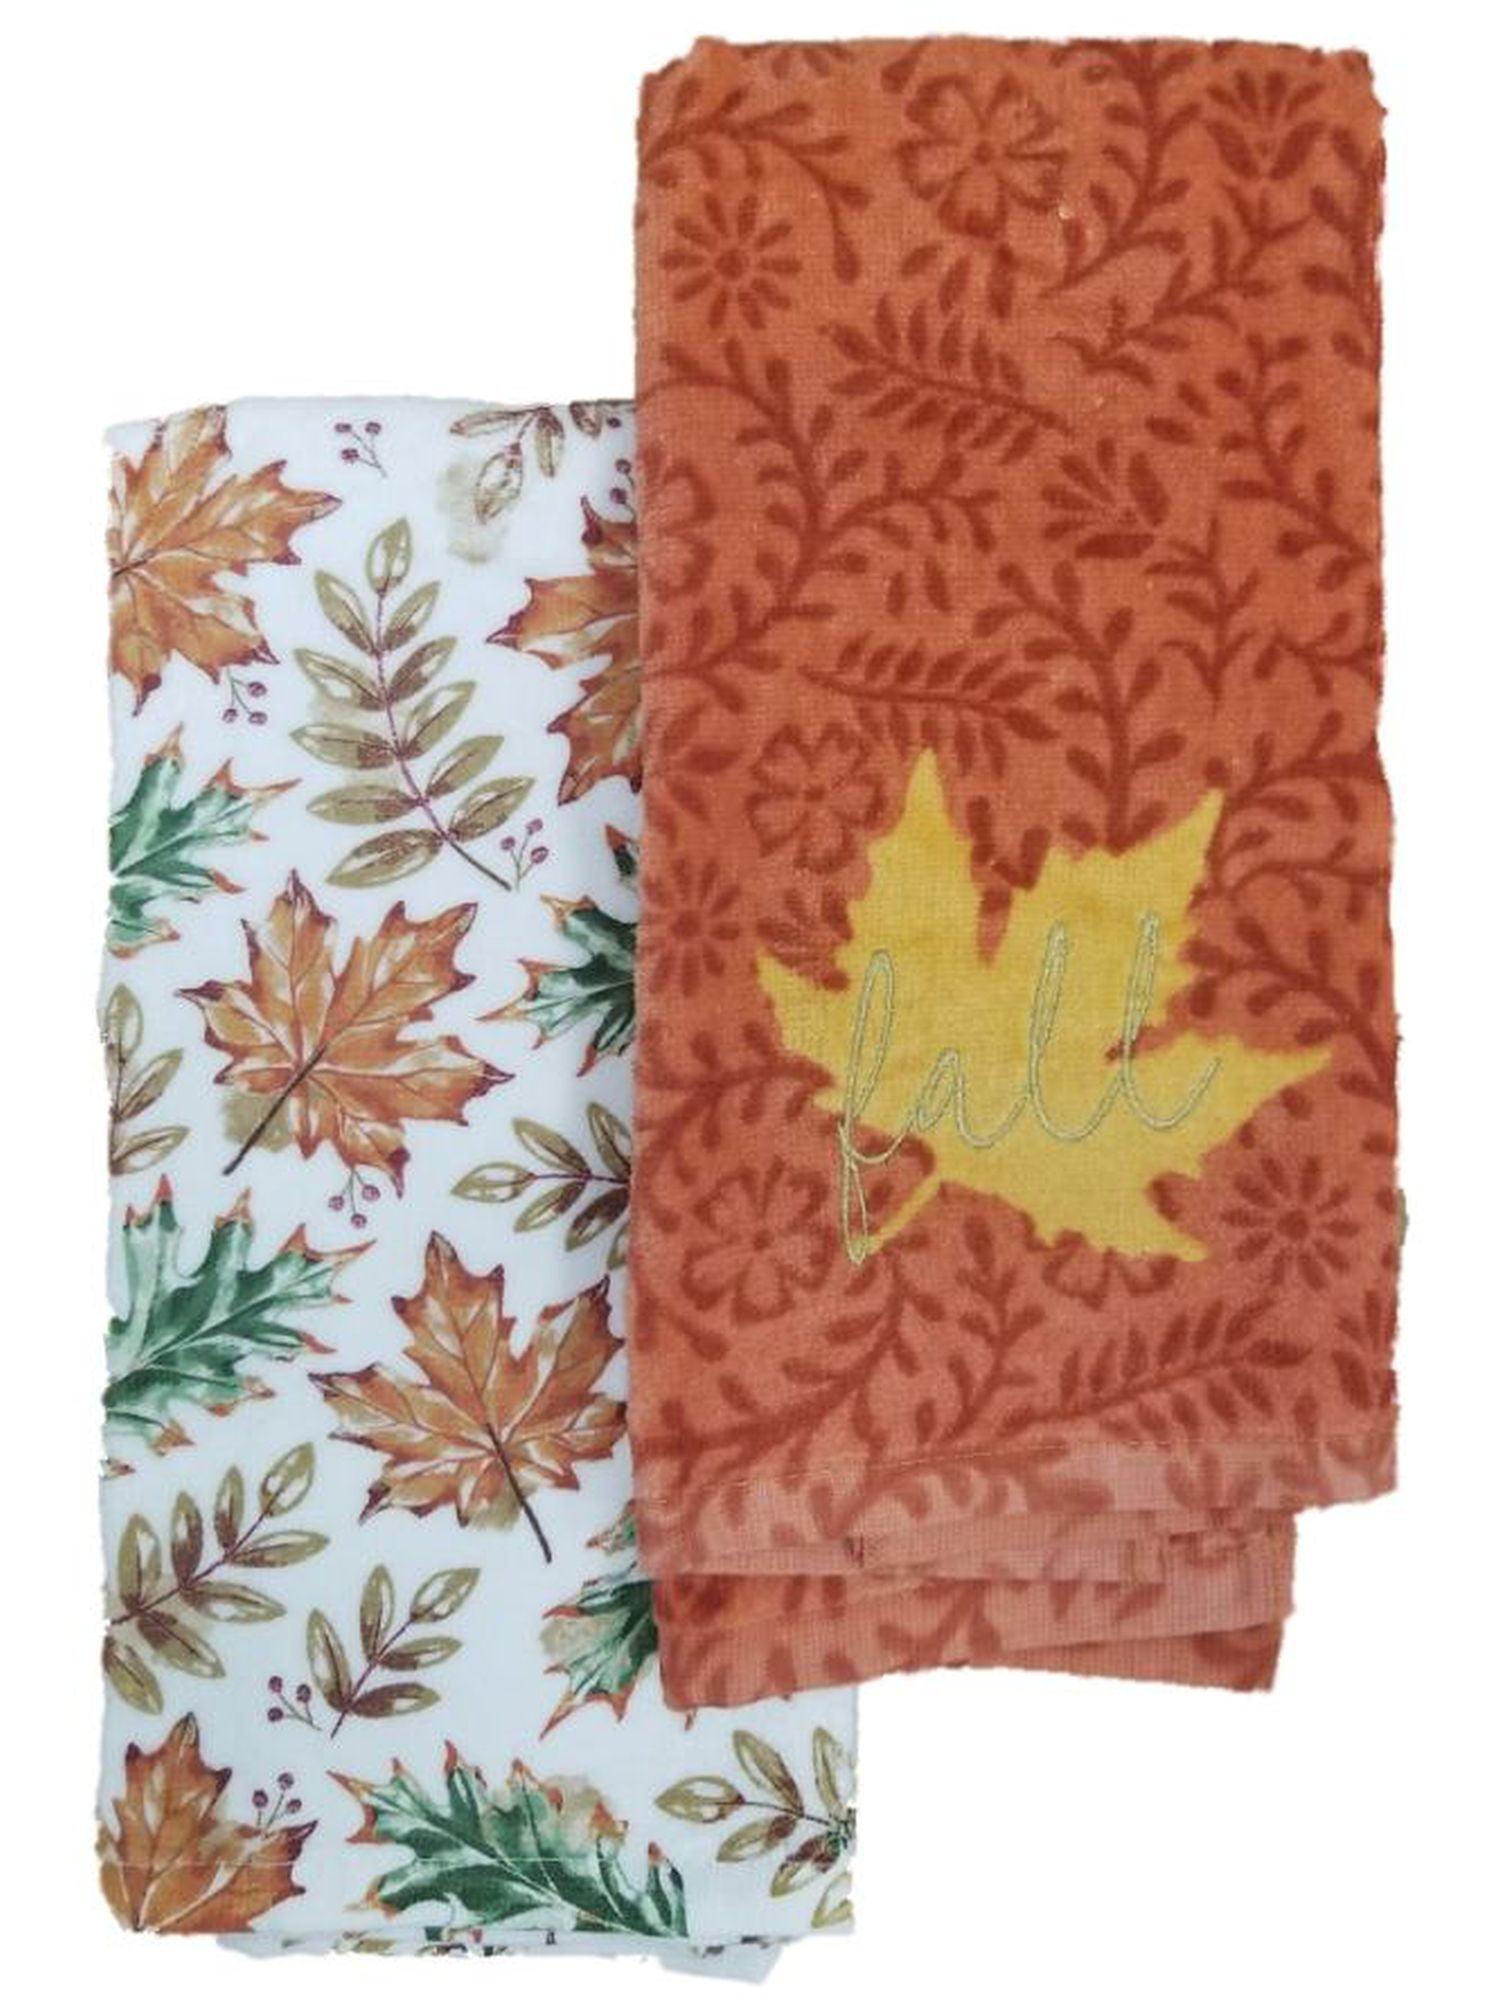 Harvest Season Fall Leaves Embroidered Autumn Kitchen Towel Set 2 Dish Towels Walmart Com Walmart Com